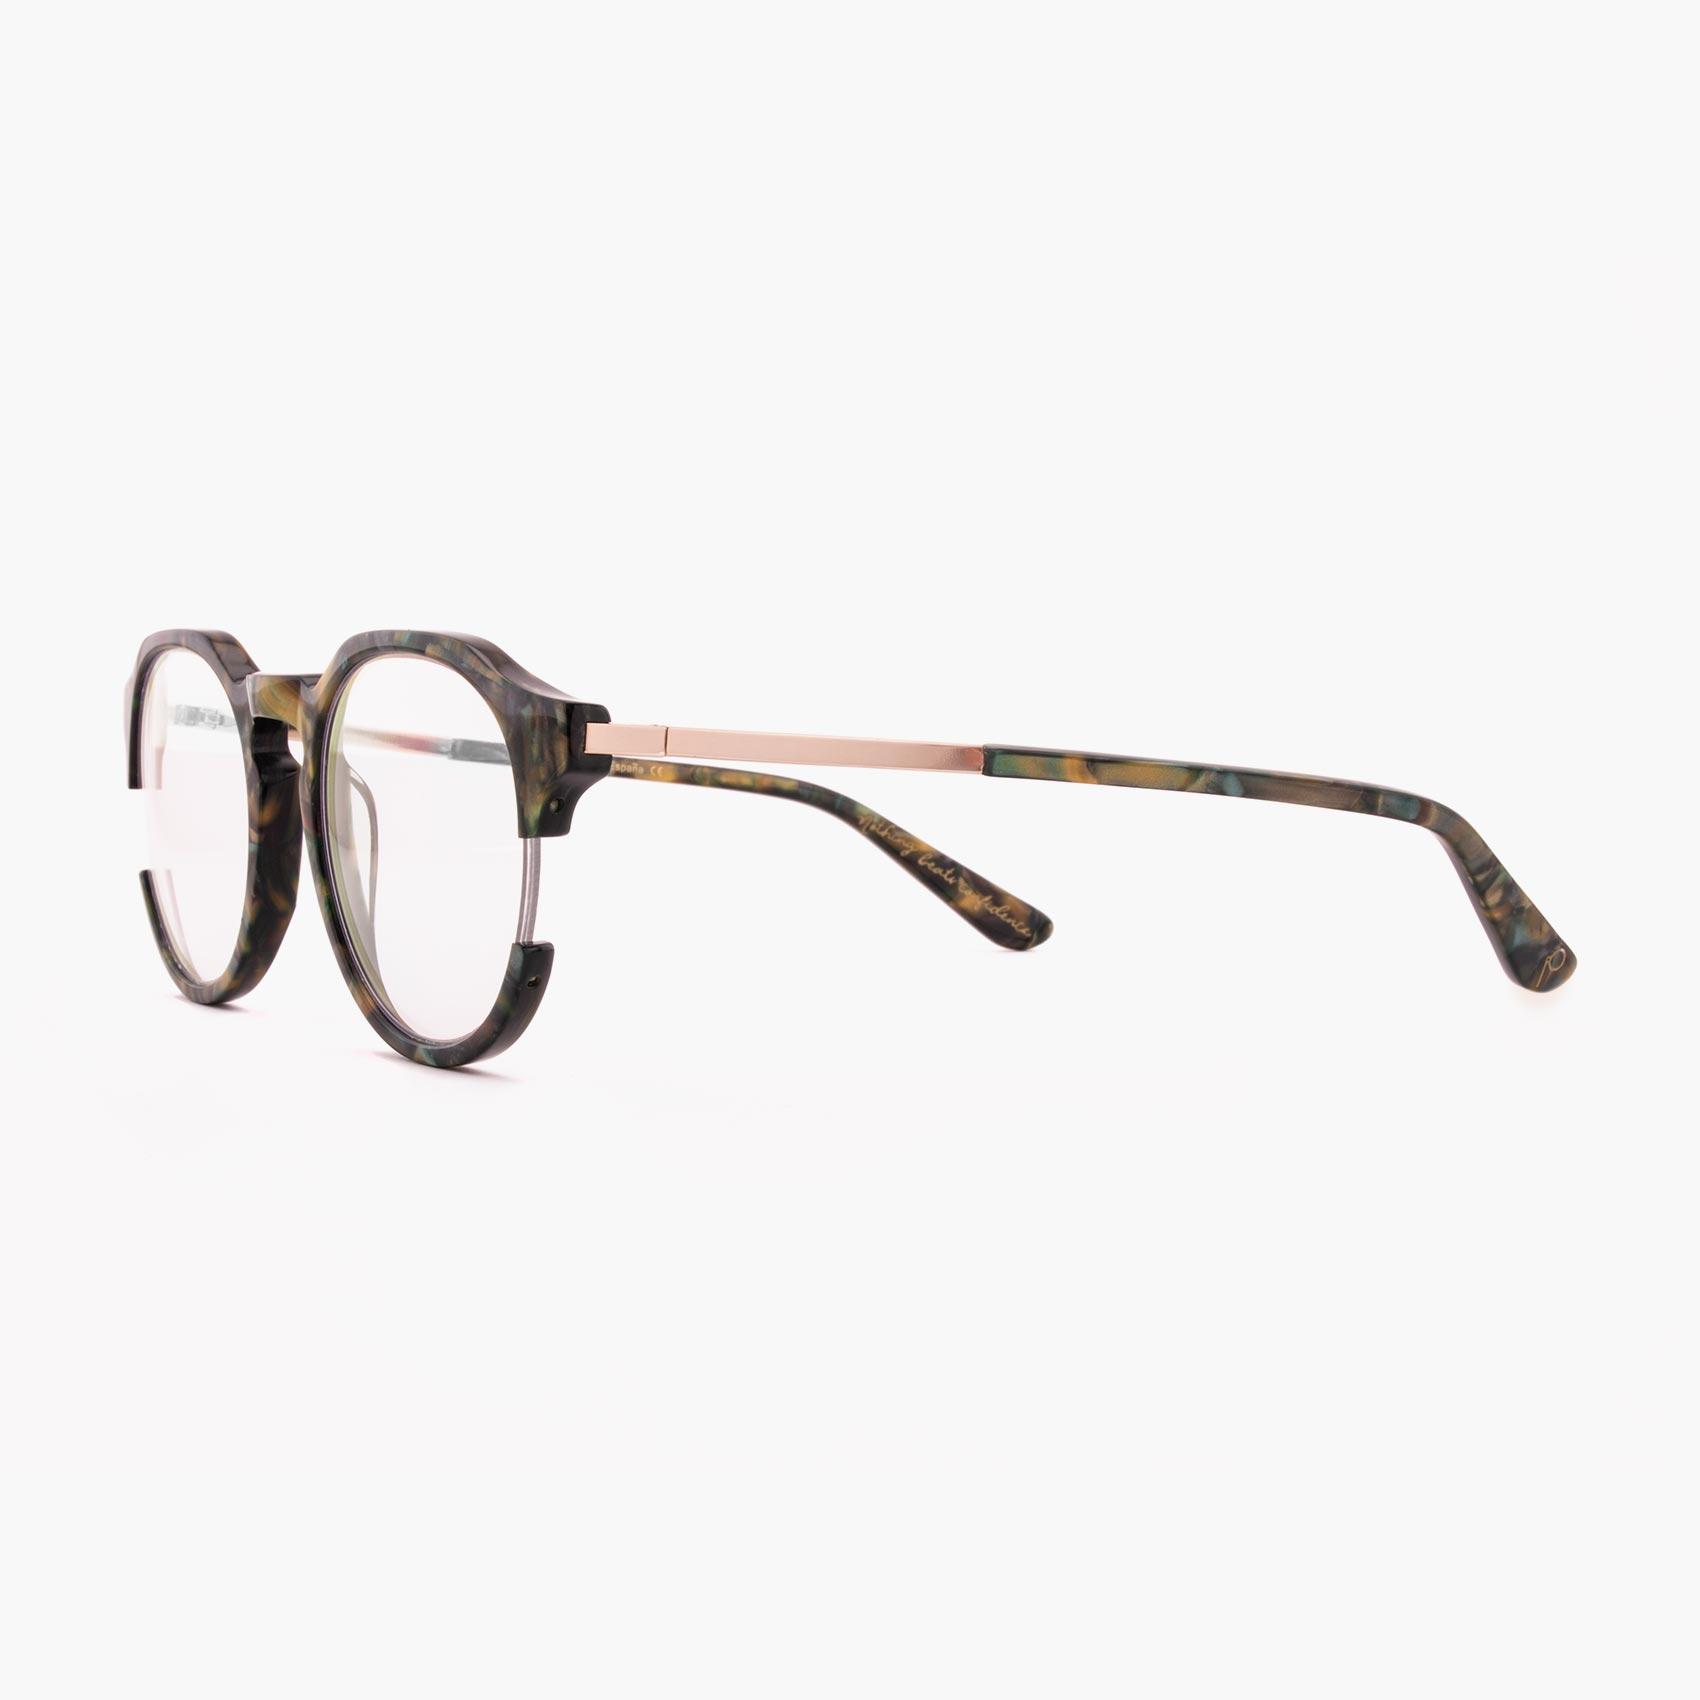 Proud eyewear Jodie C3 L montura gafas mujer graduadas